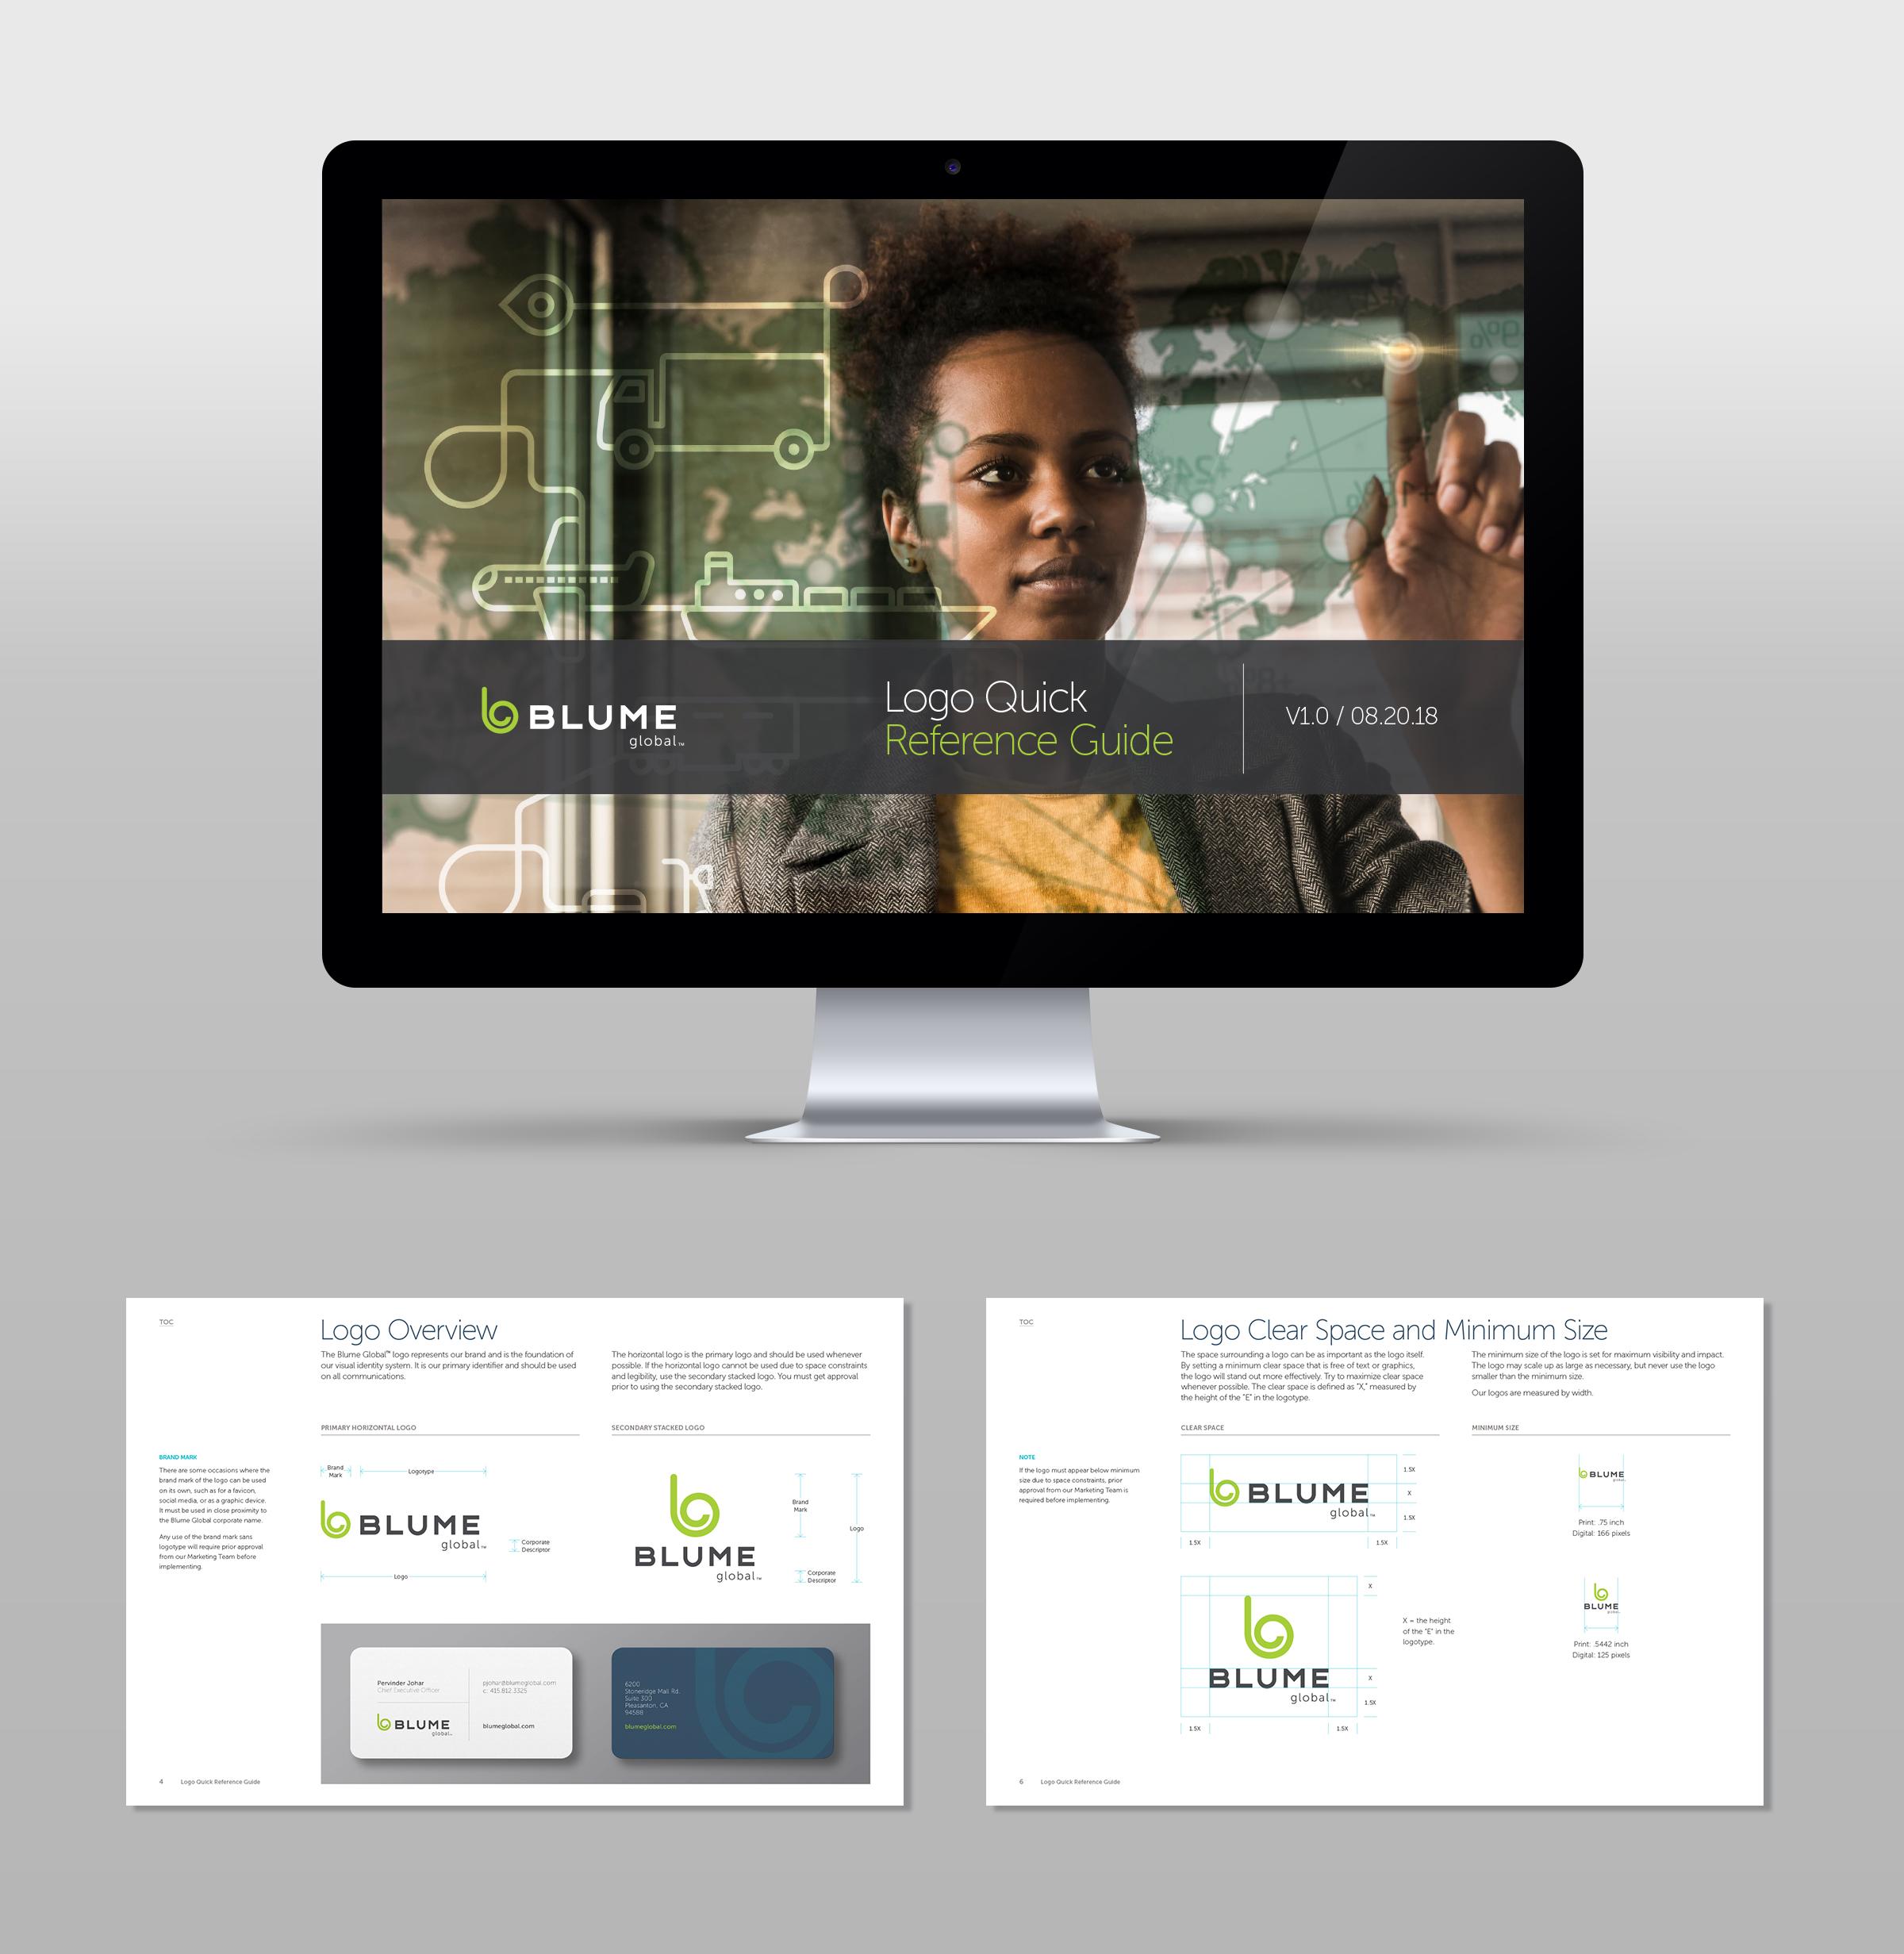 Blume_Brand_Guidelines-Mock-up.jpg